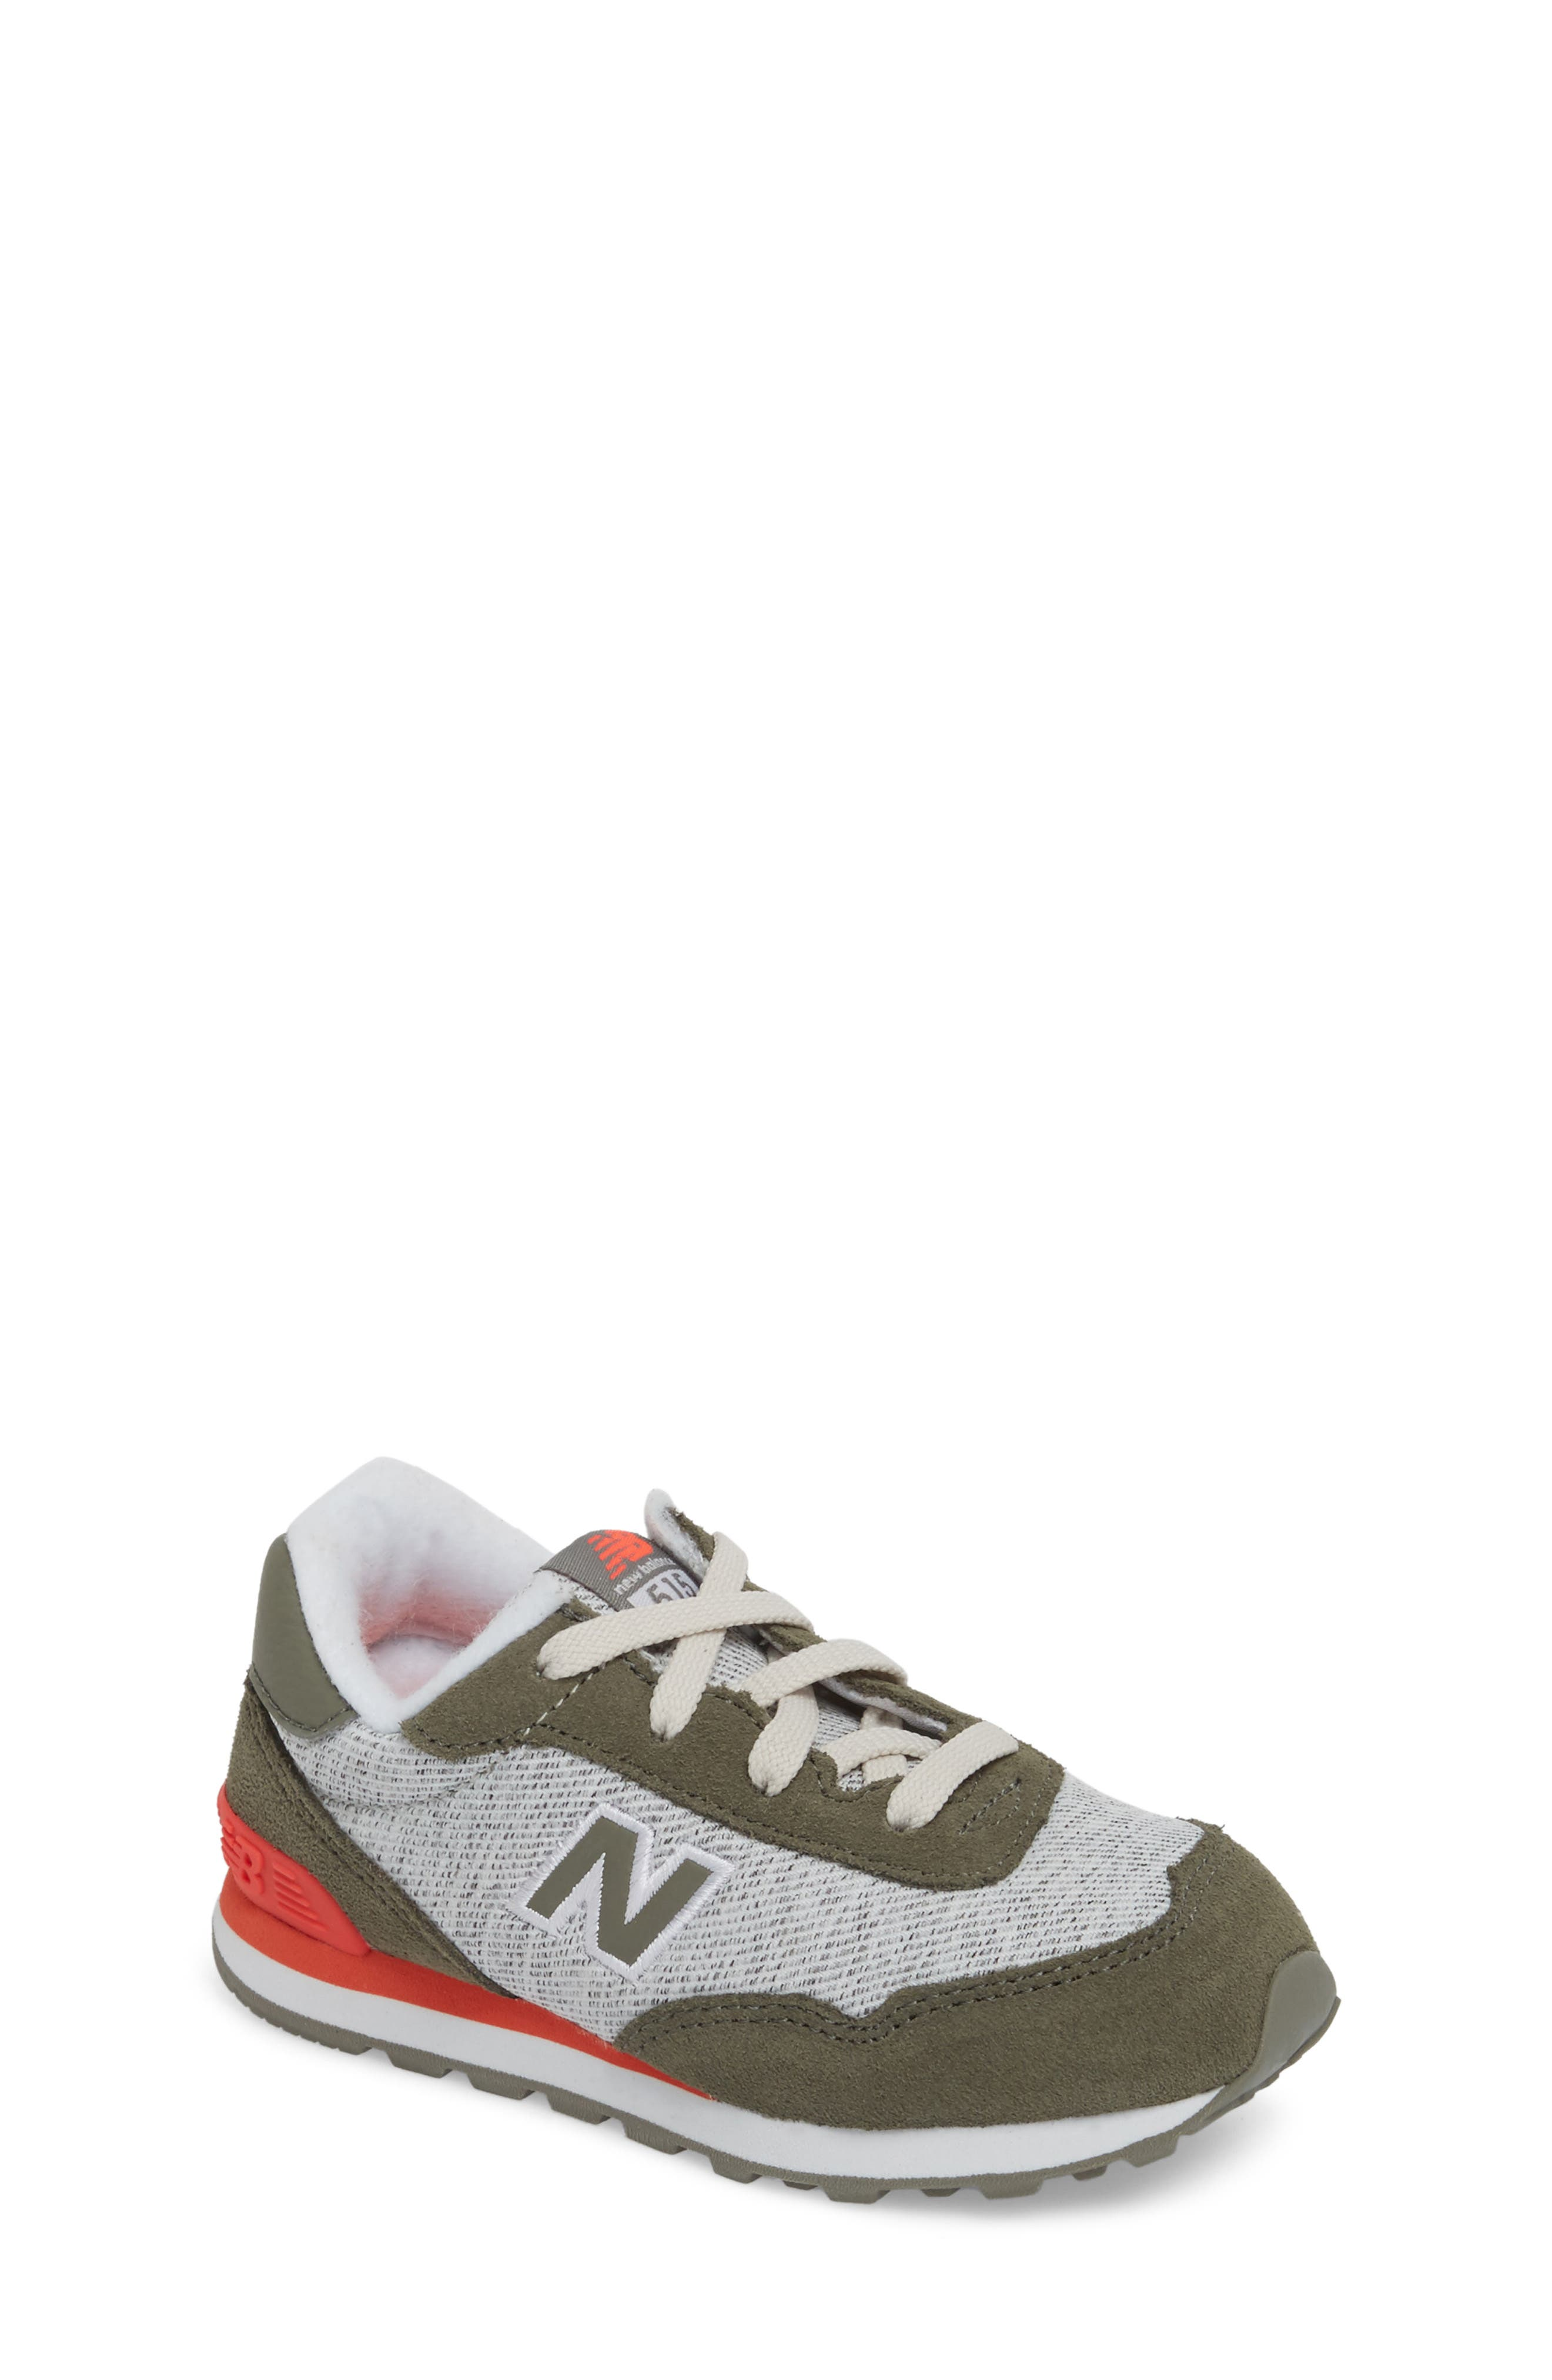 515 Sneaker,                         Main,                         color, Green